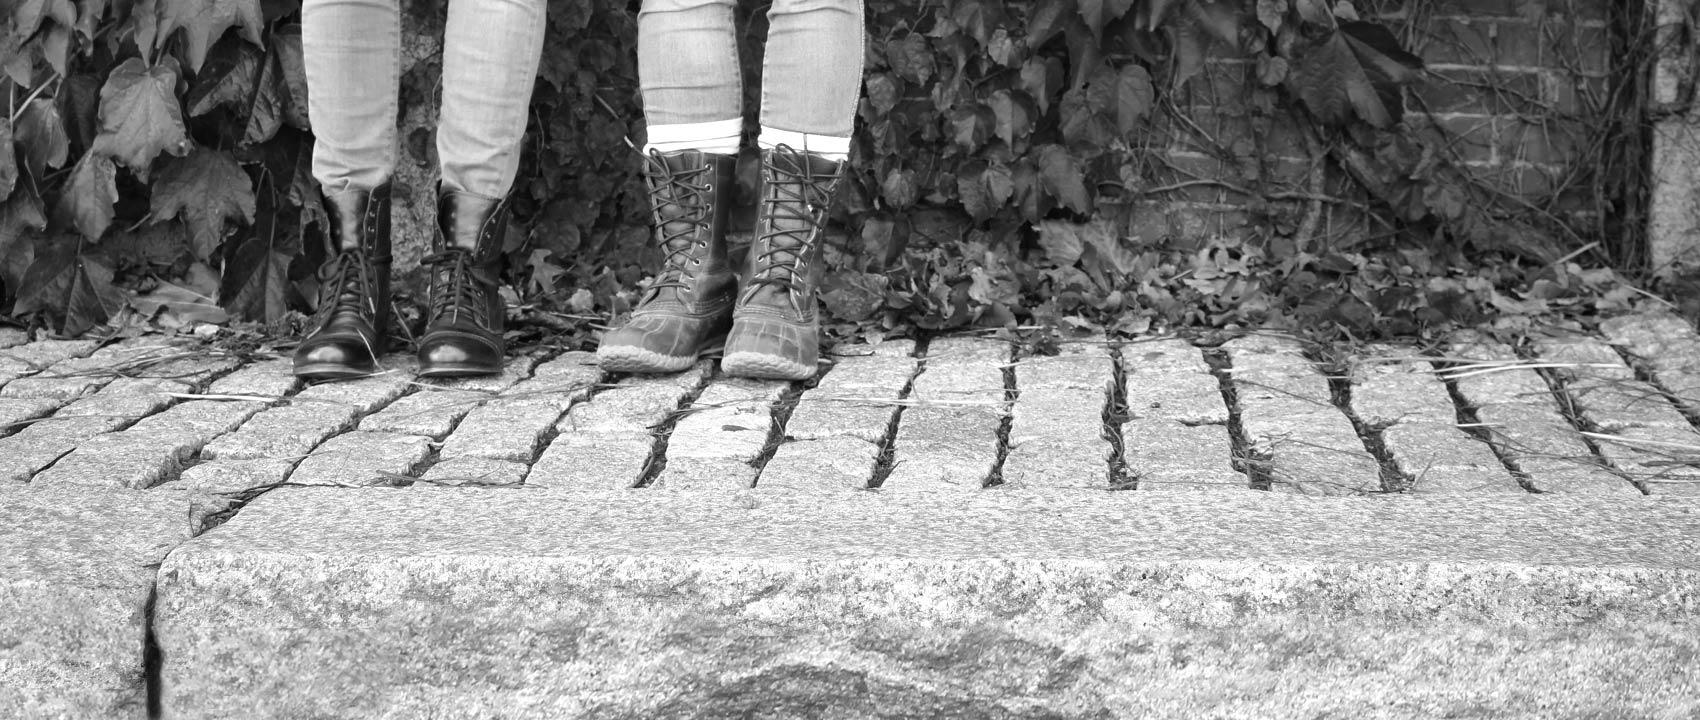 Meg and Elise standing on a brick sidewalk